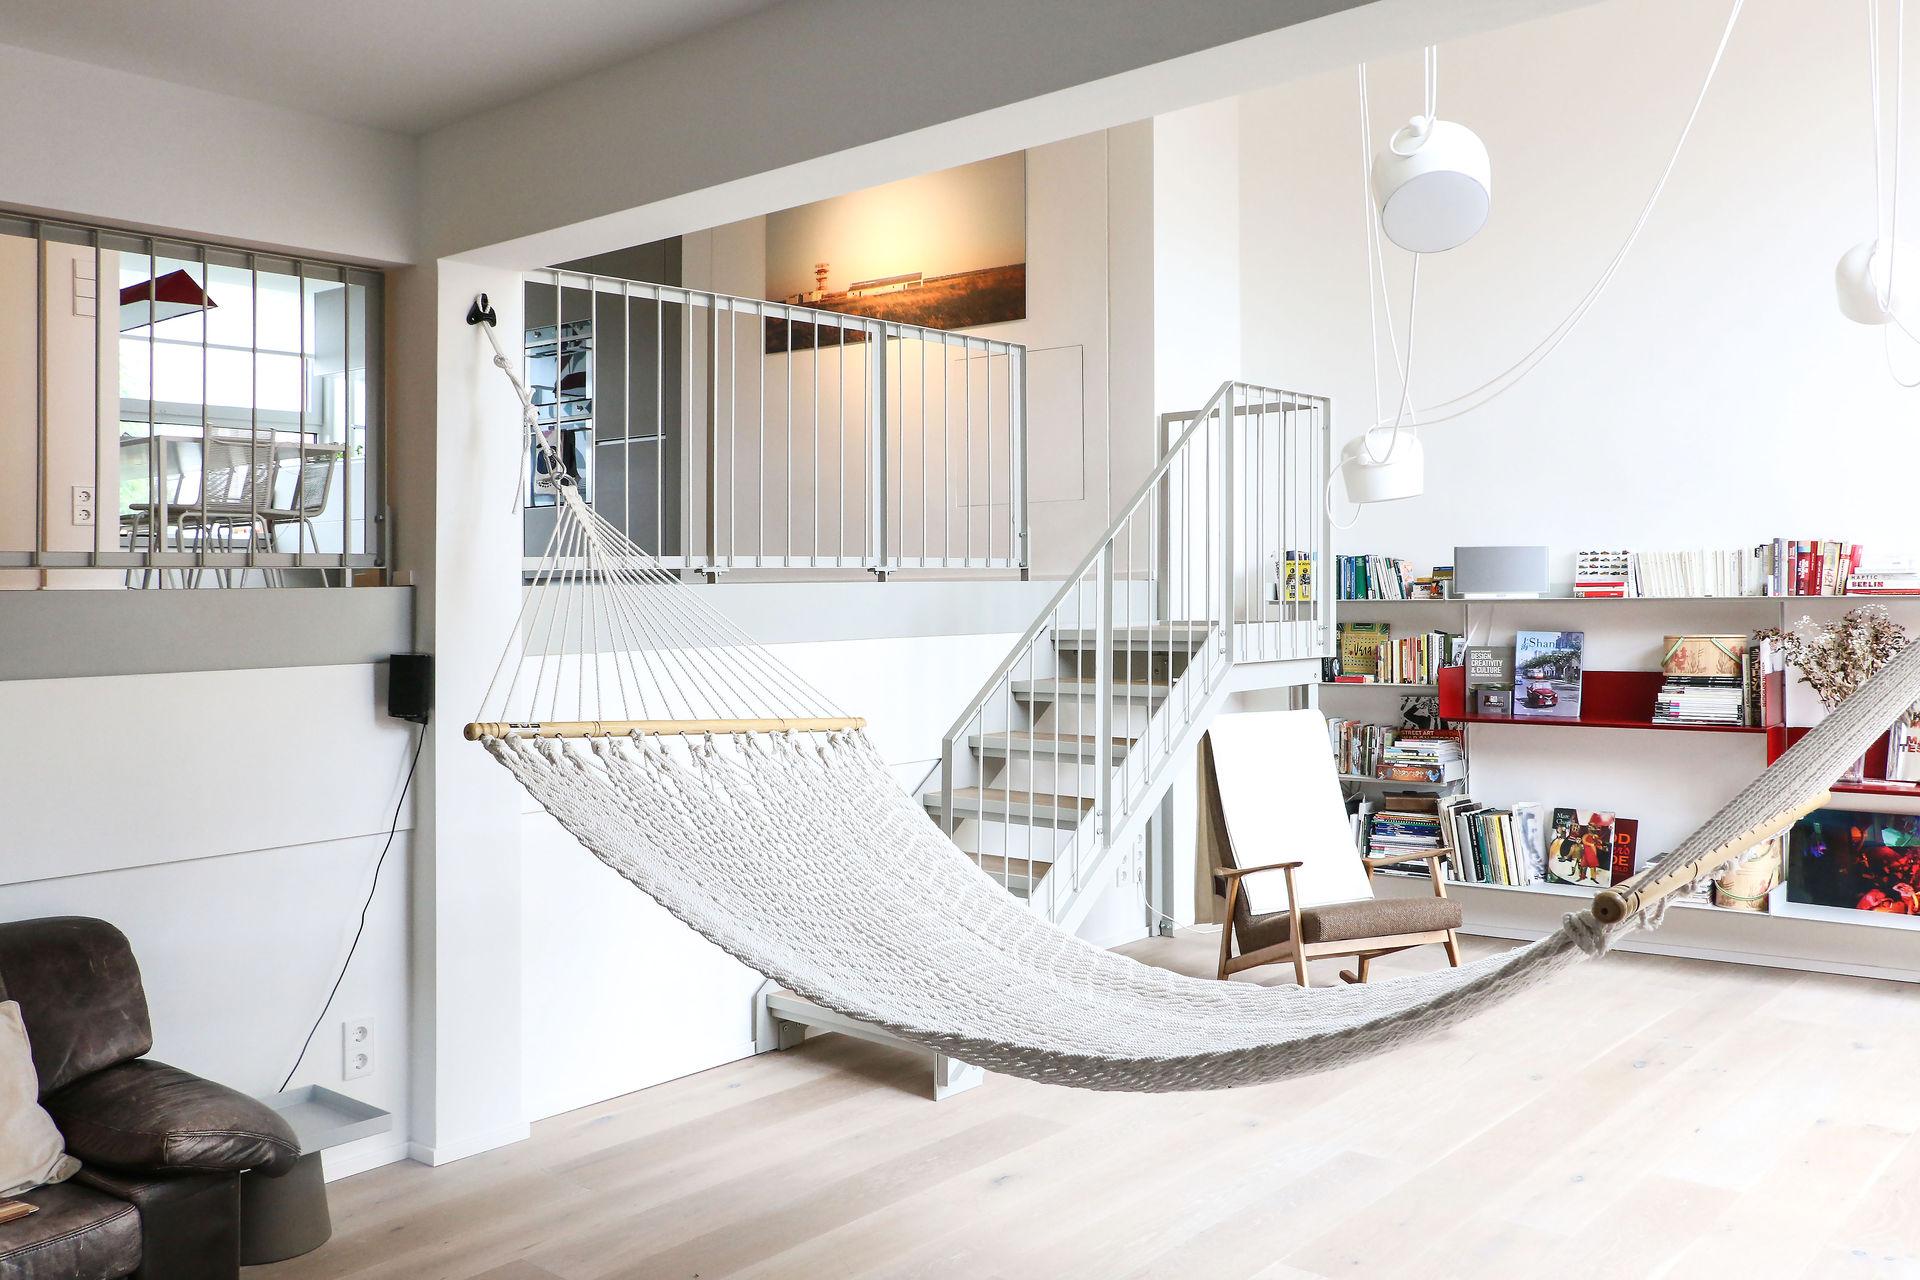 Loft-style home in Berlin-Kreuzberg - Home Exchange